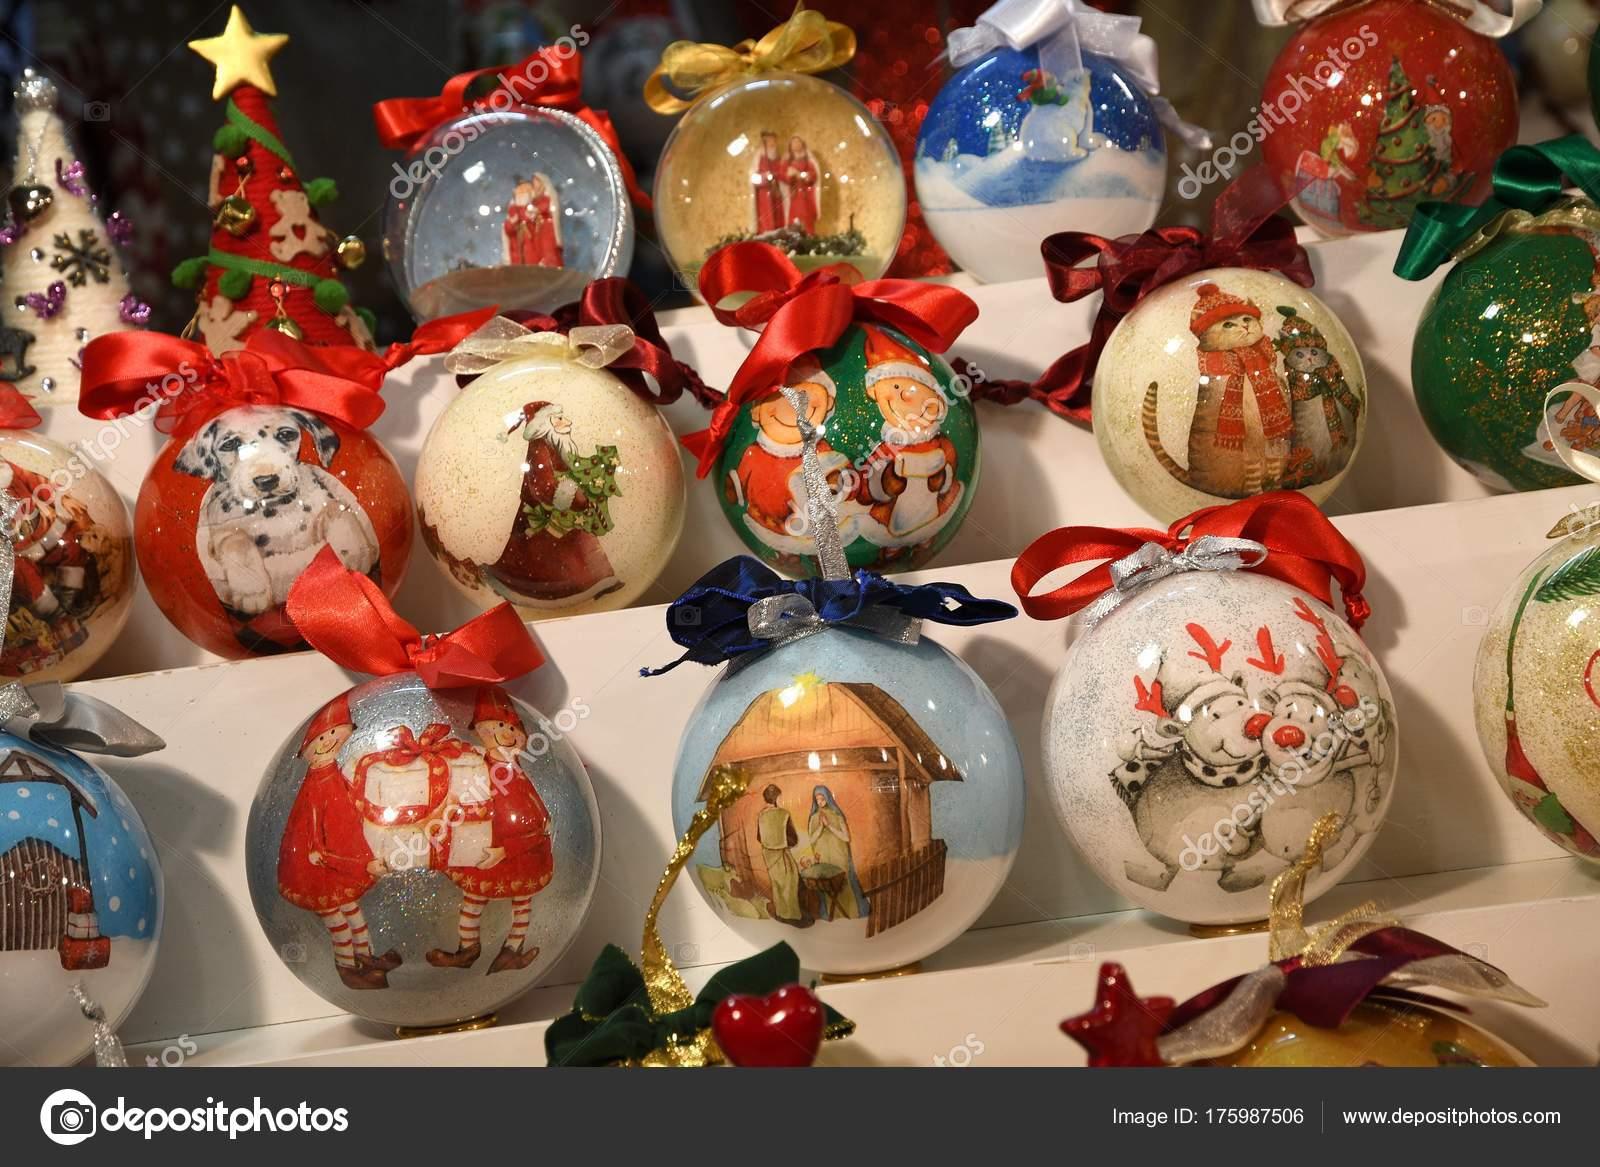 Florencia diciembre 2017 adornos navidad mercado navidad for Adornos navidenos 2017 trackid sp 006